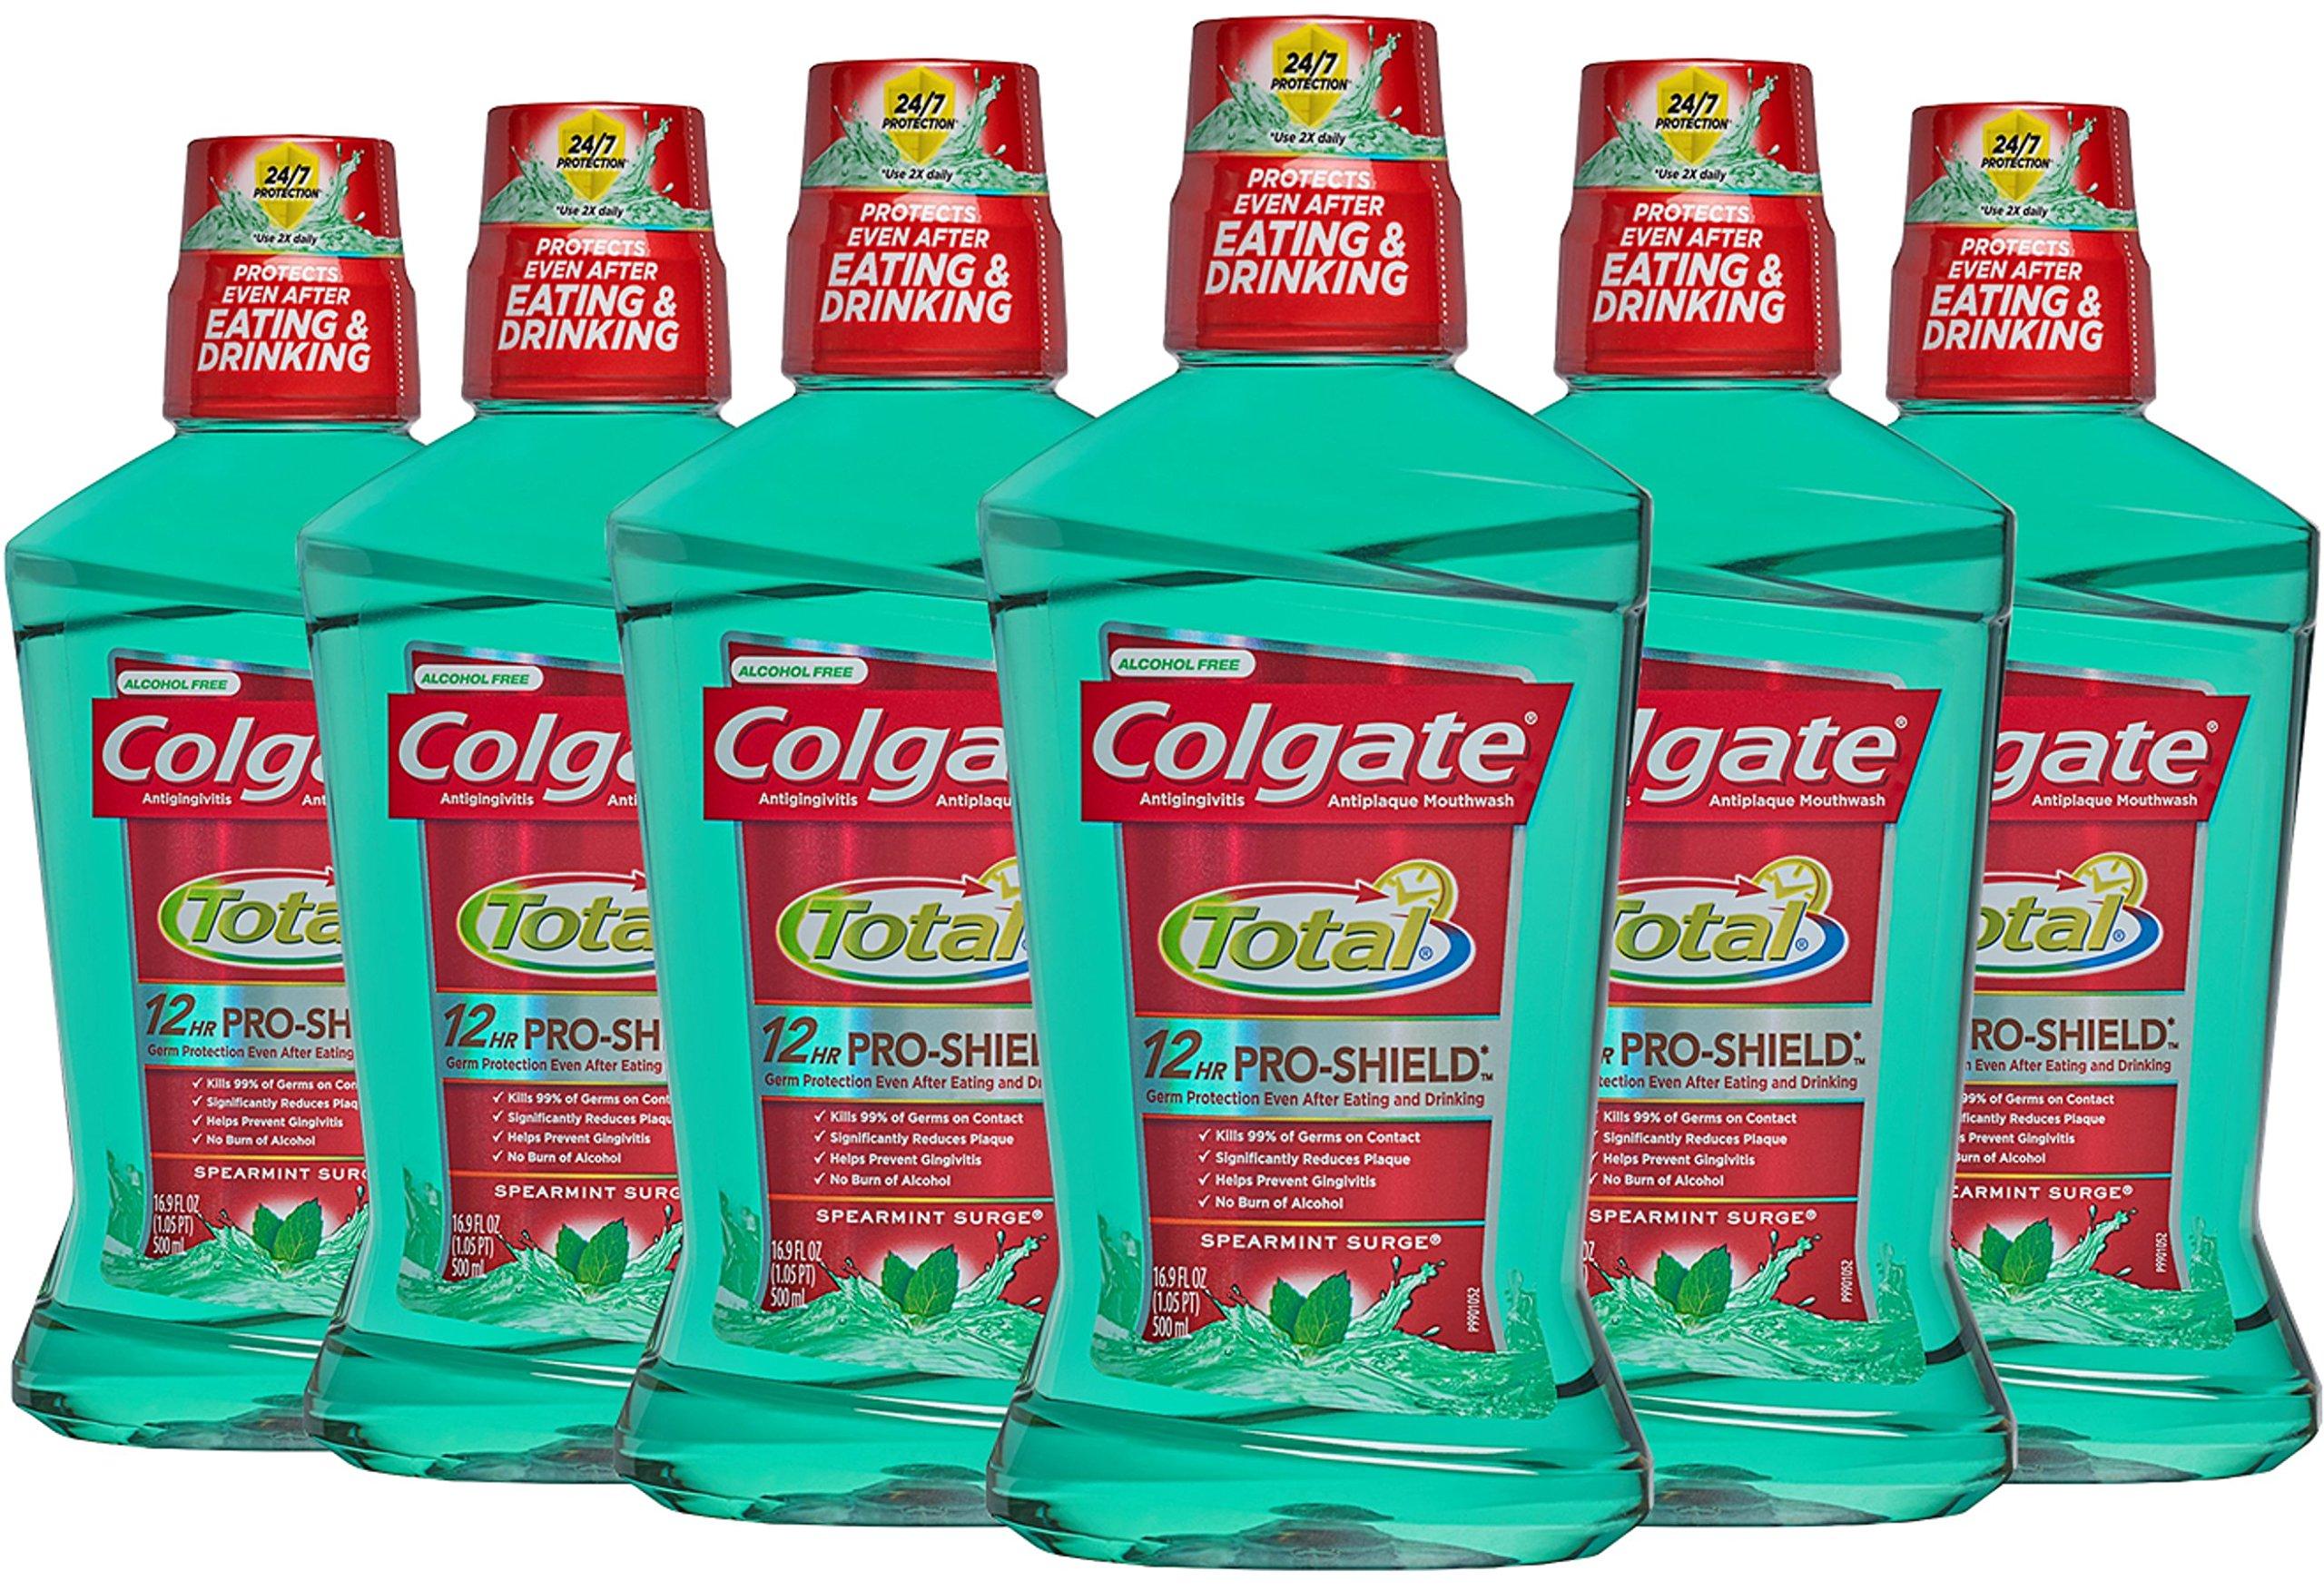 Colgate Total Pro-Shield Mouthwash, Spearmint - 500 mL (pack of 6)